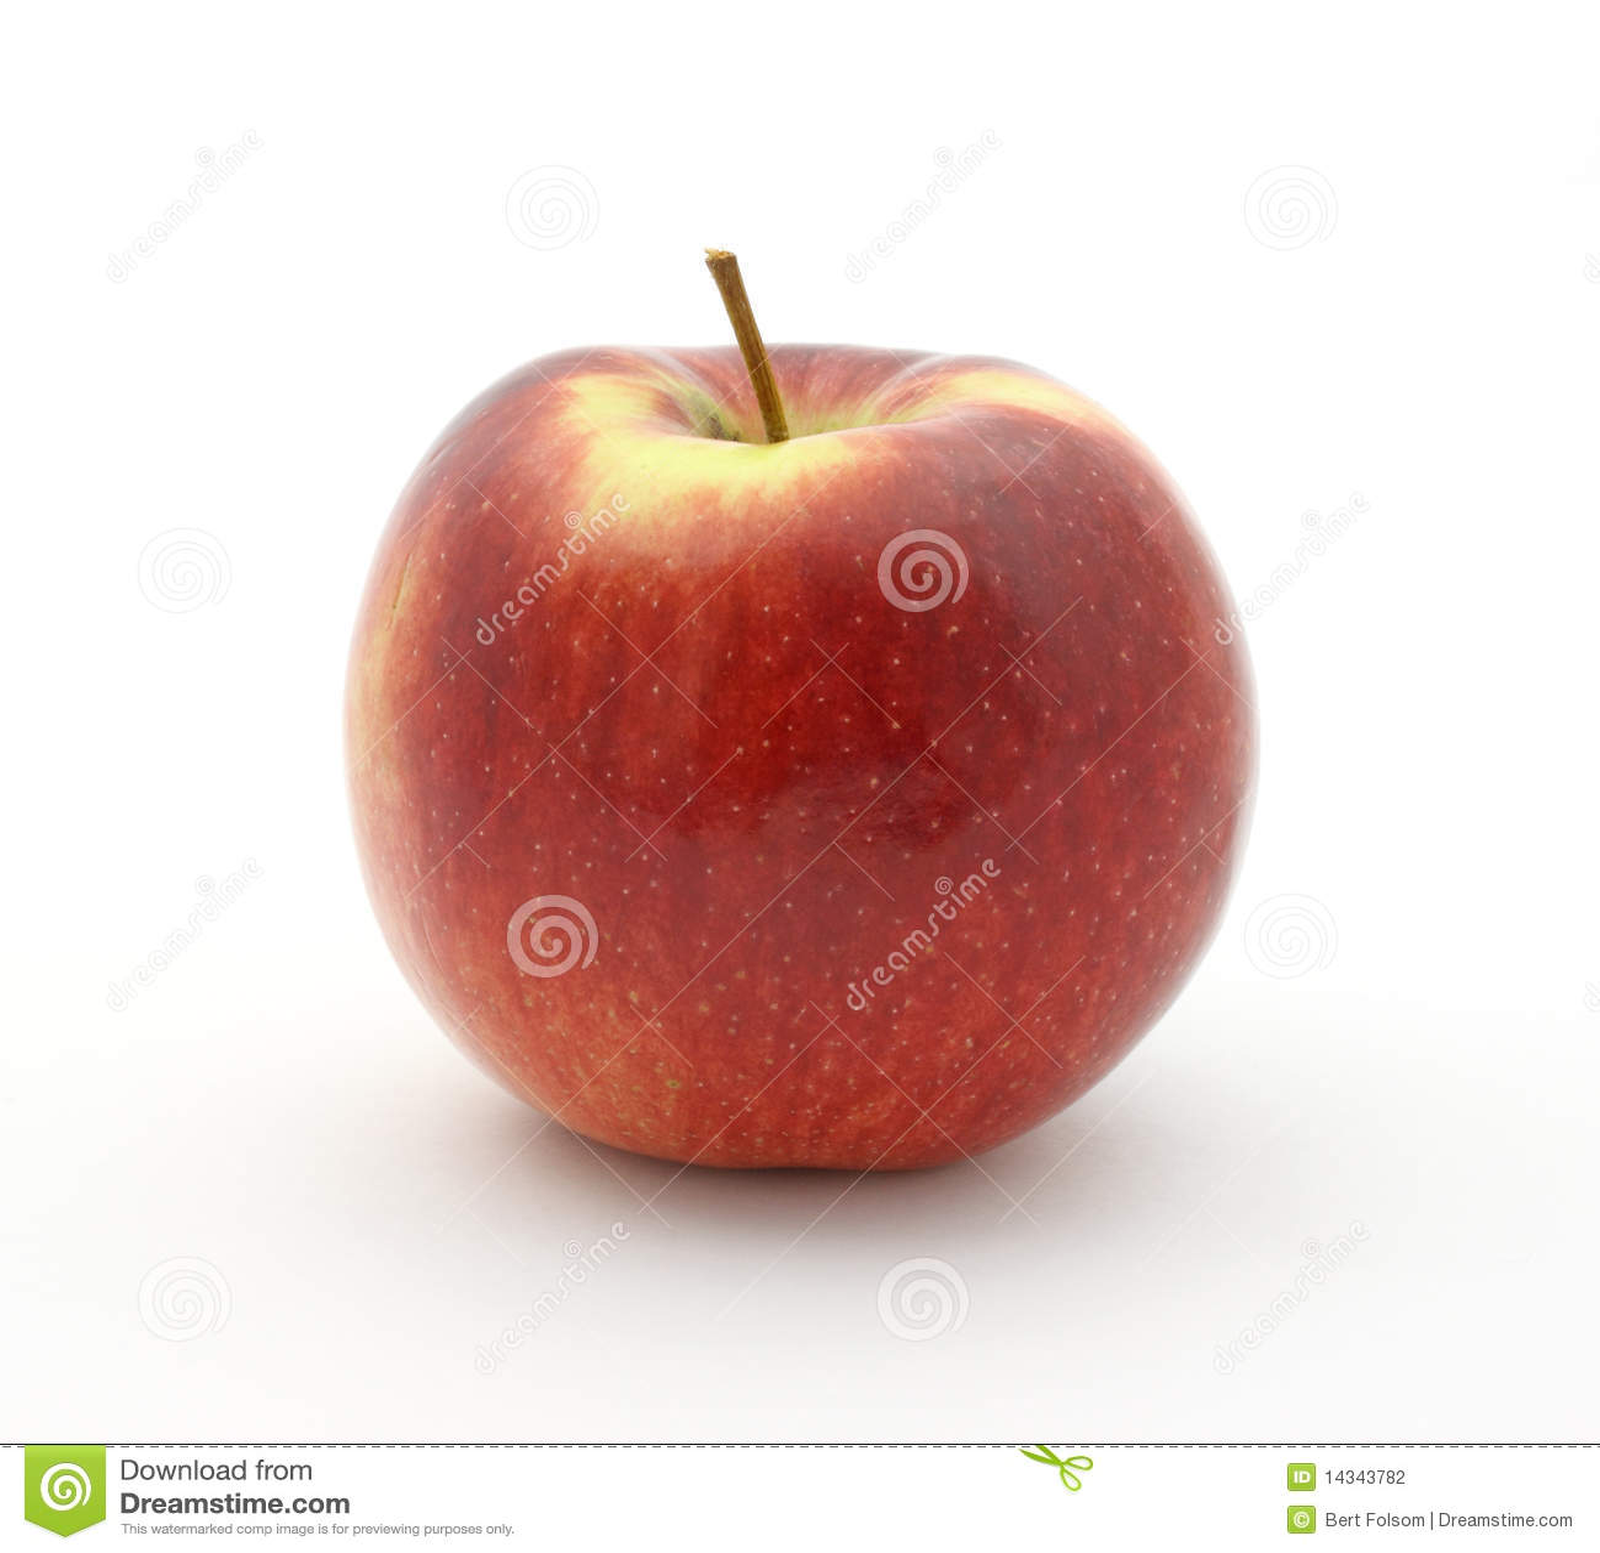 Empire apple on white background